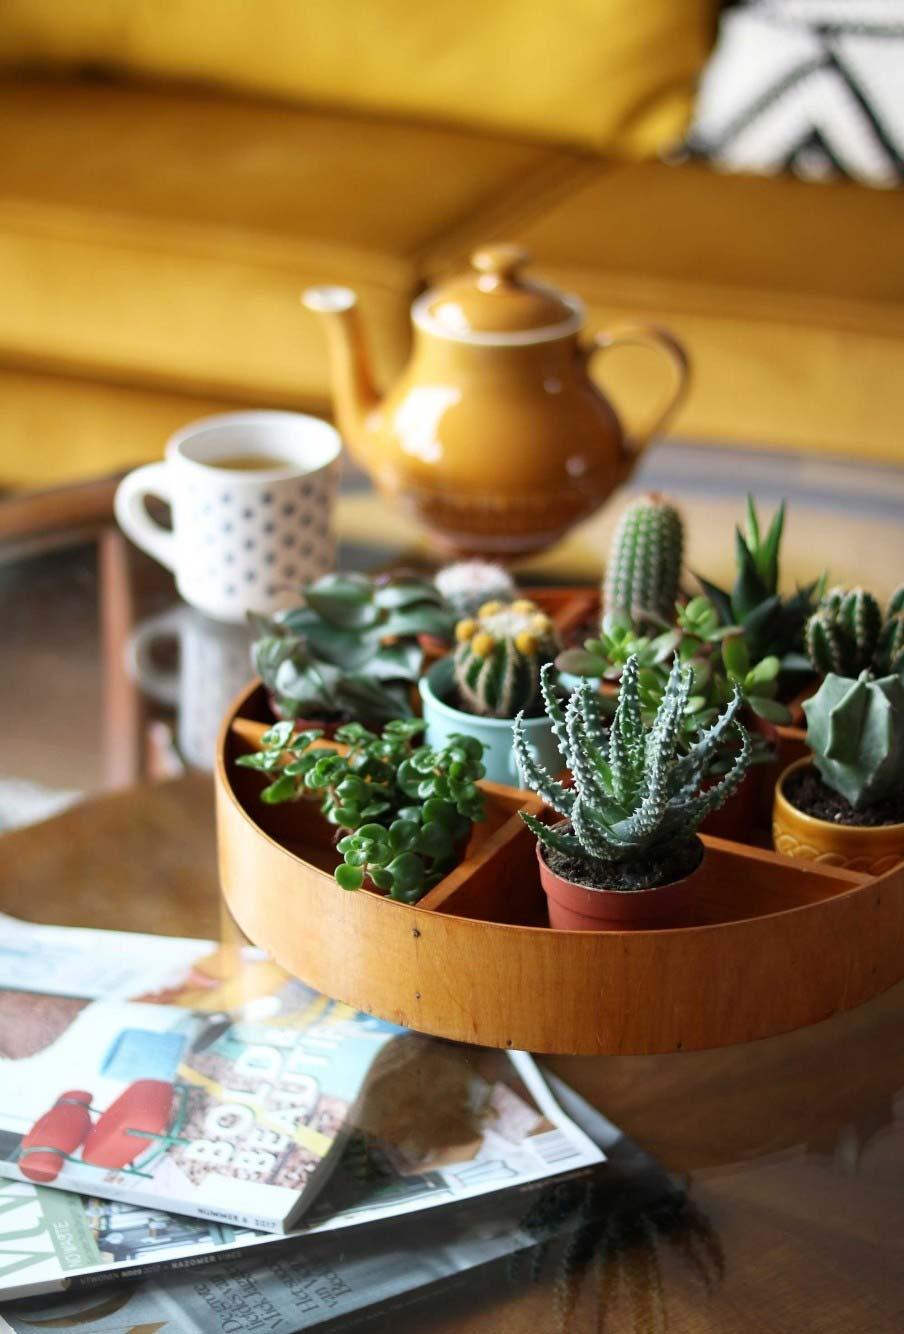 Um mini jardim dentro de casa